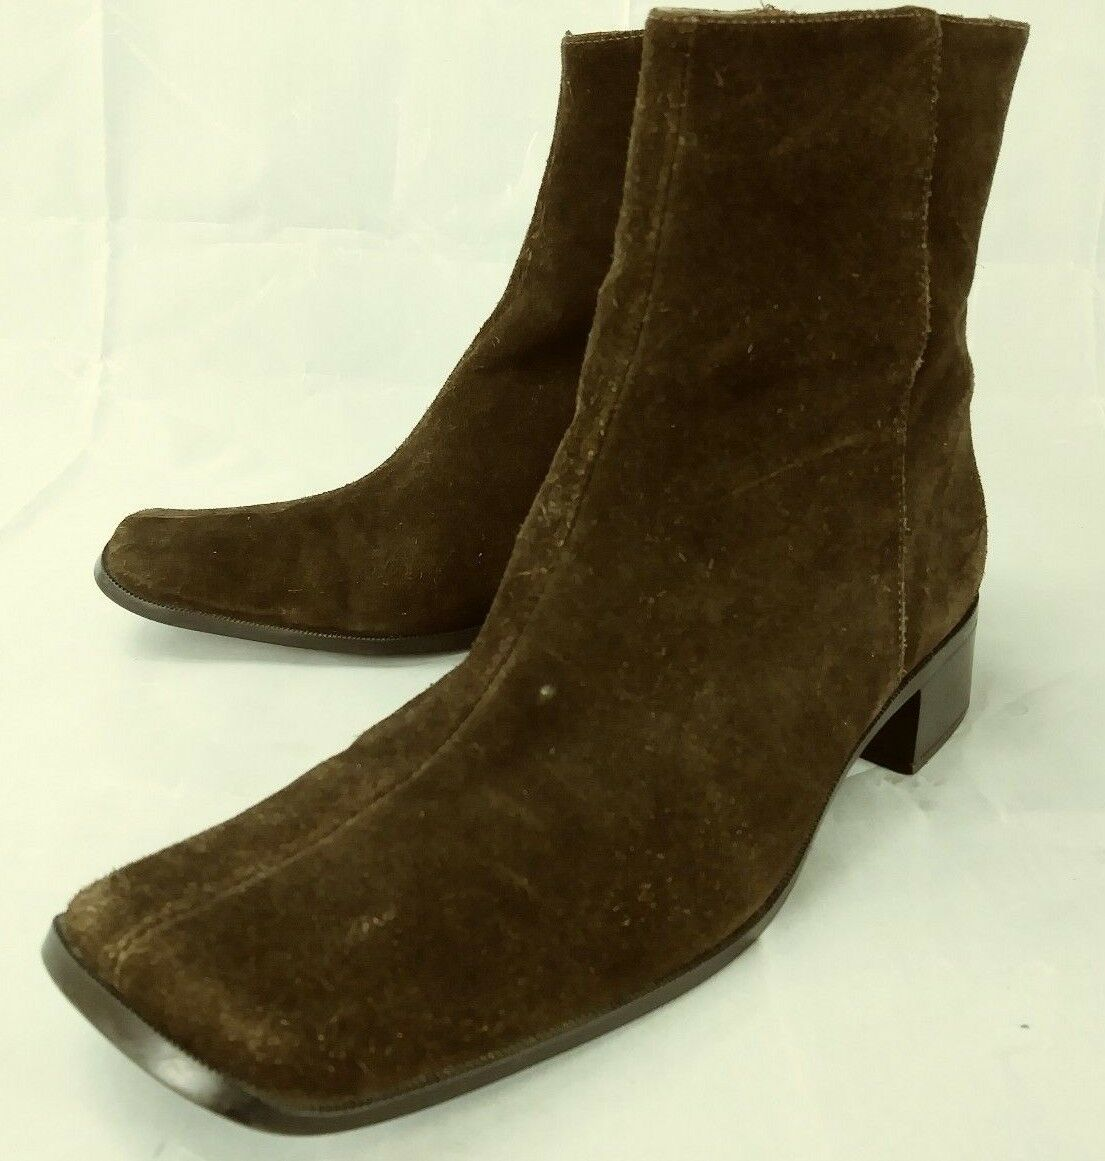 Unisa Womens Boots Ankle WHEEL US 8 B Brown Suede Zip Heels Work Dress shoes 96